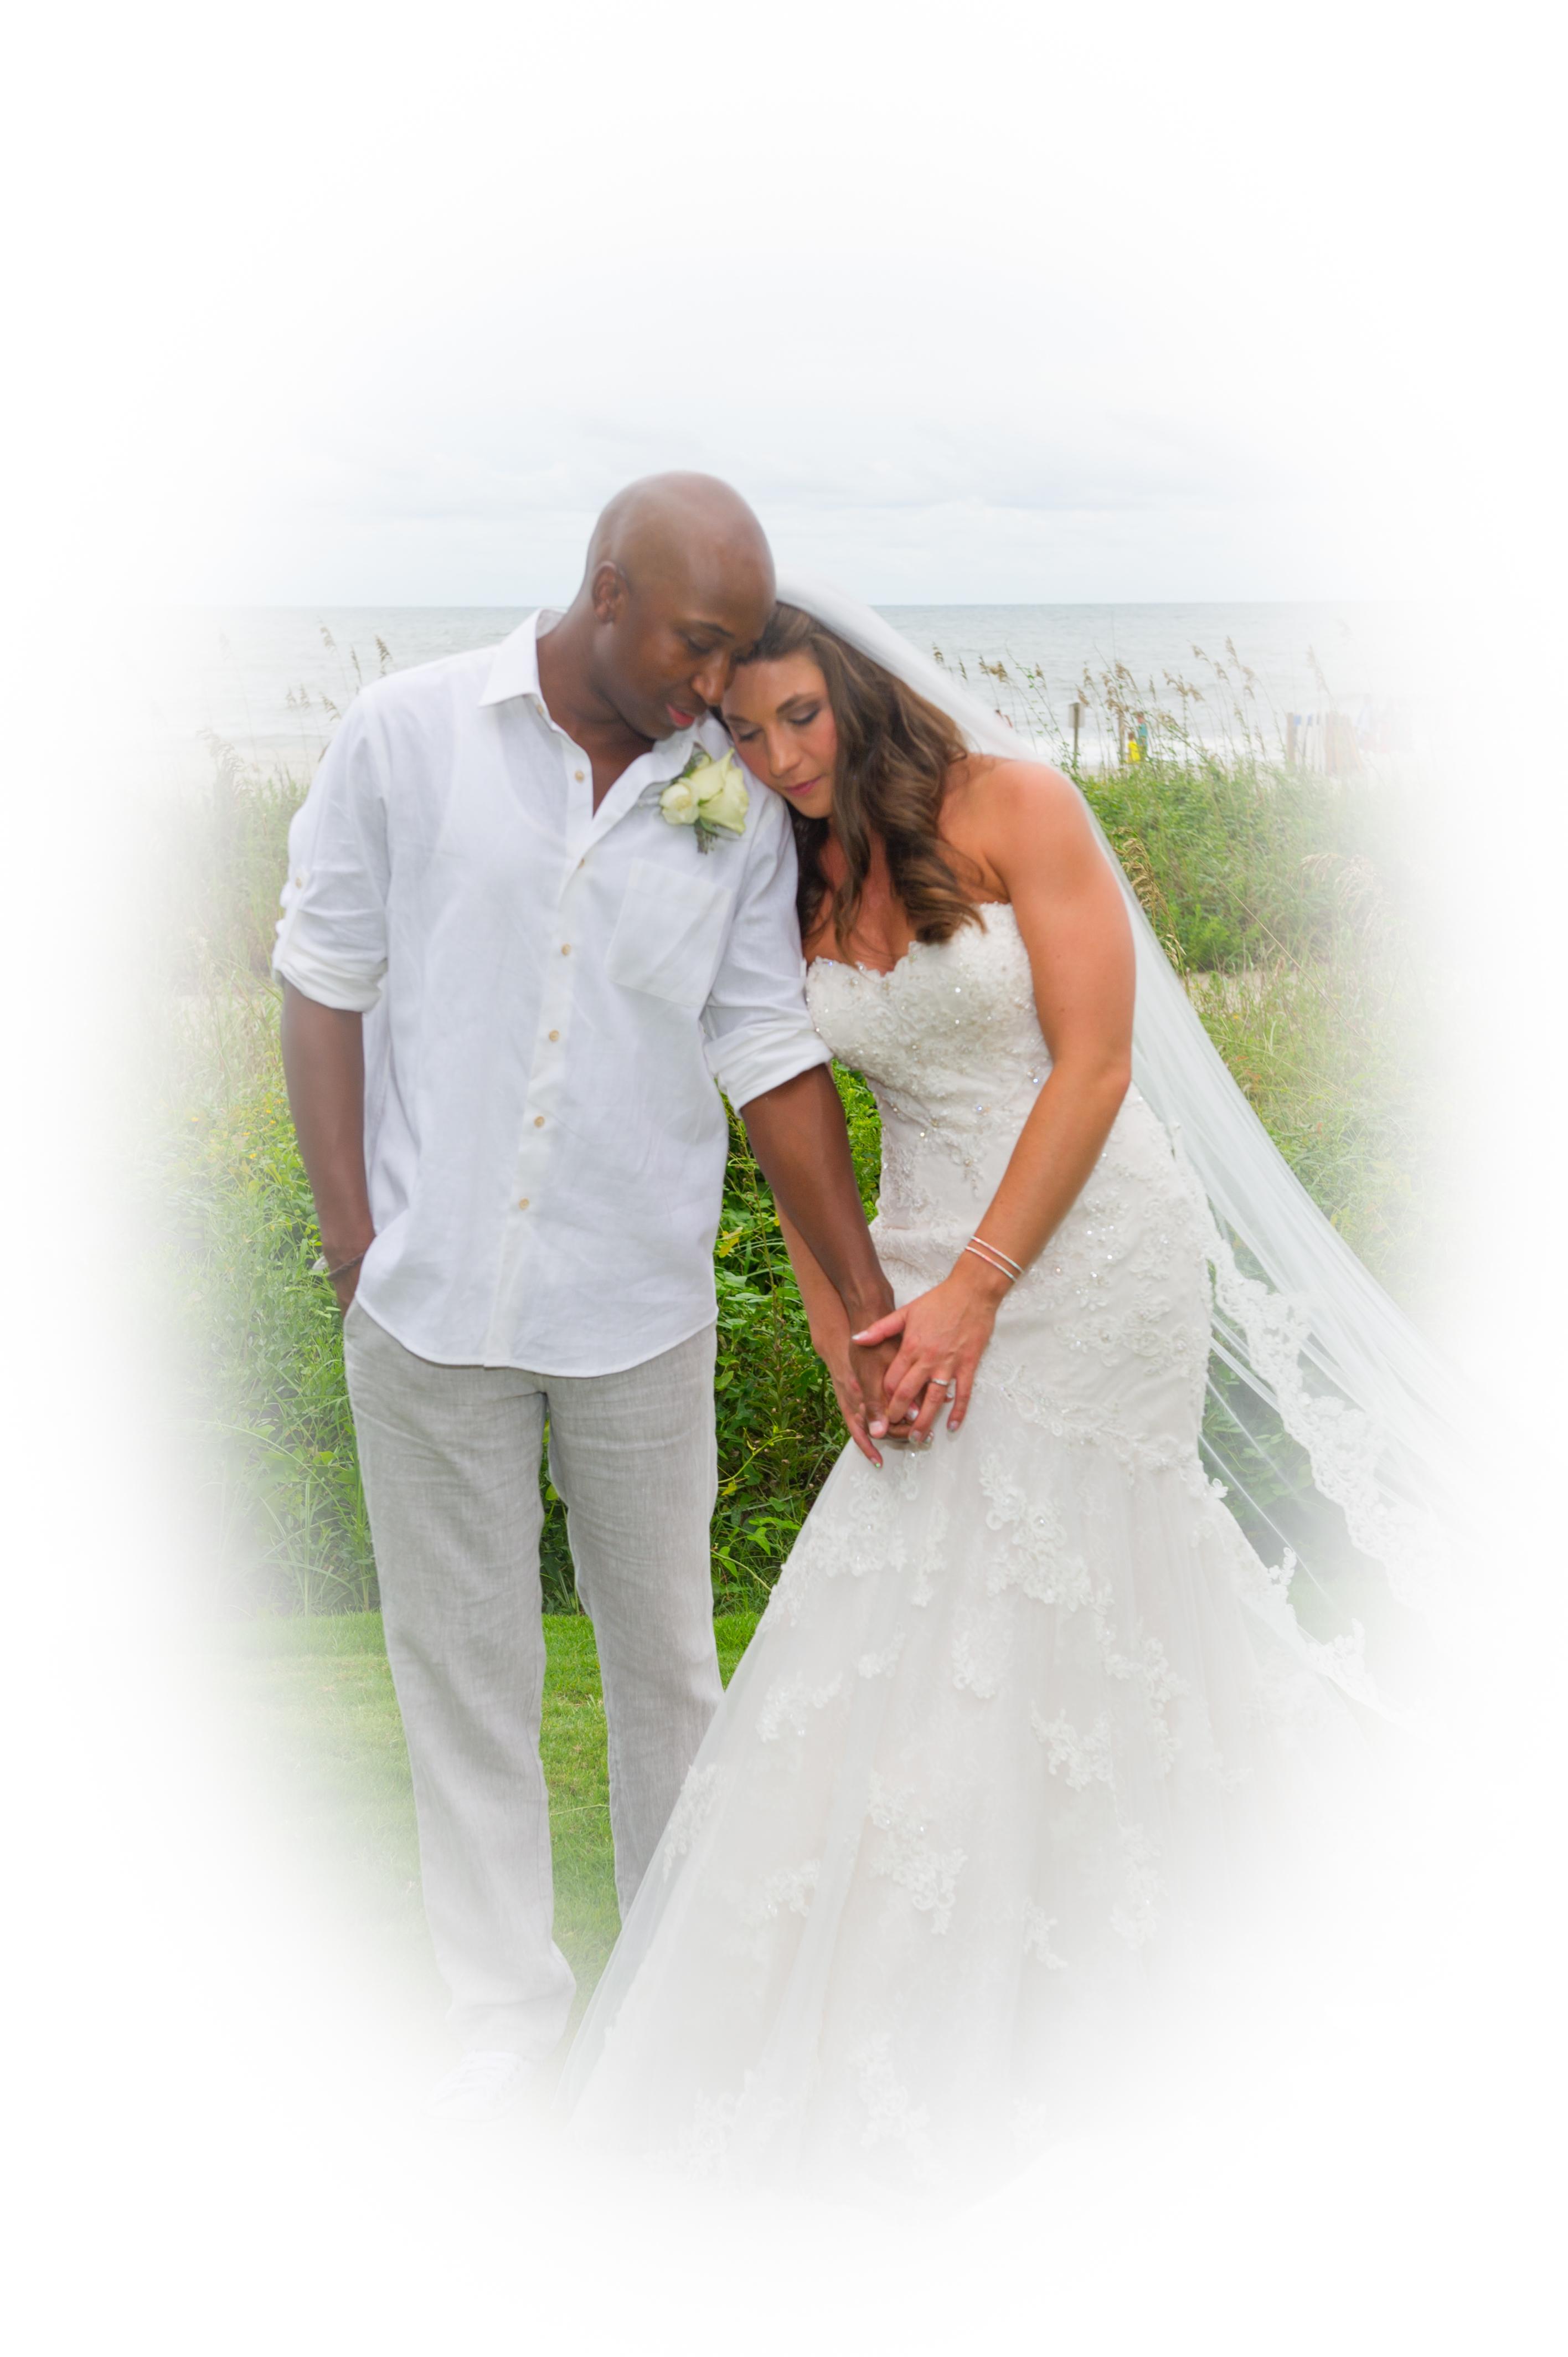 Wedding Photographer near Myrtle Beach